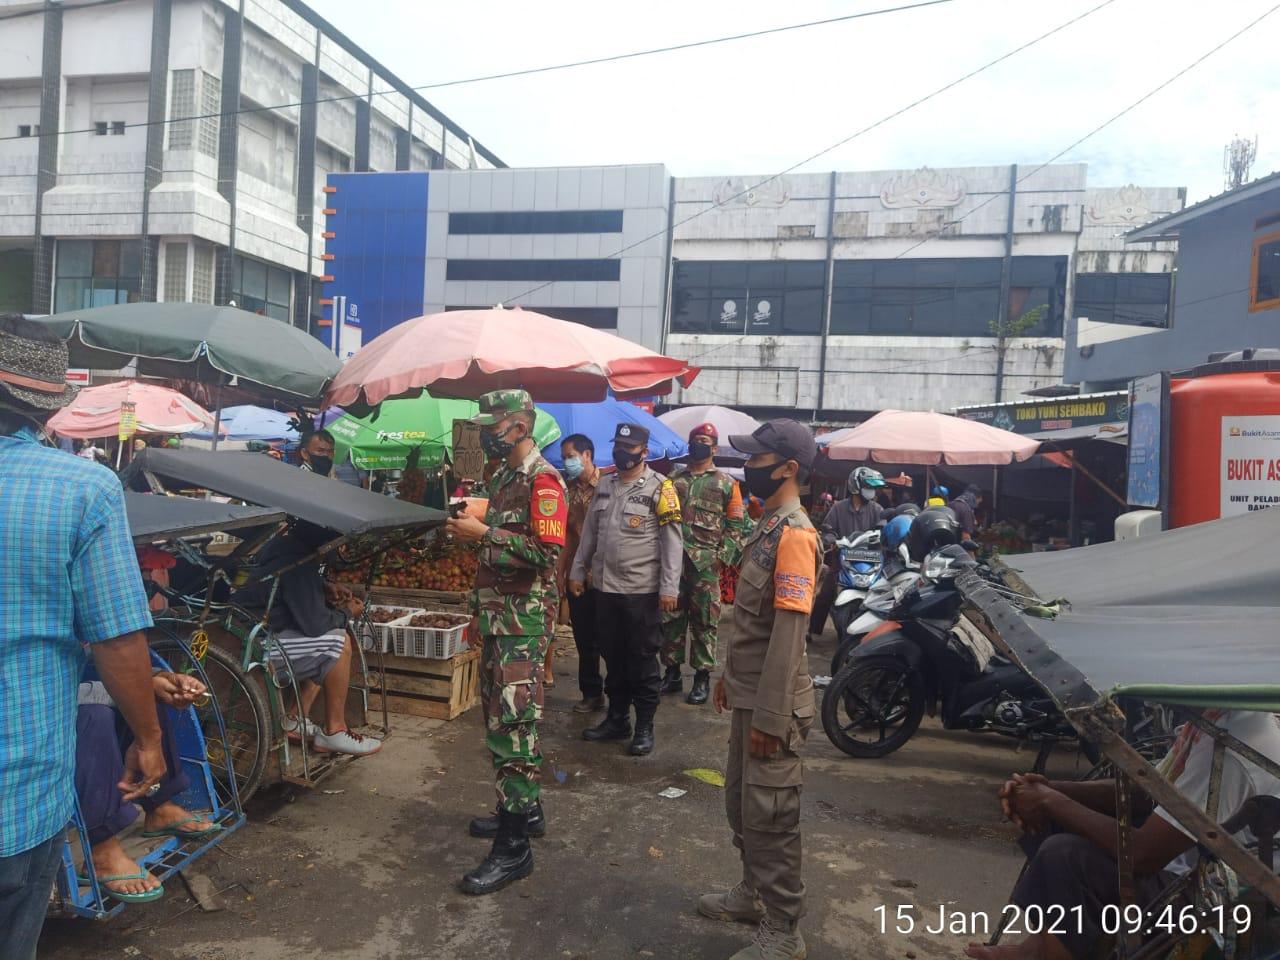 Babinsa Koramil 410-04/TKT Serda Fadli bersama dengan Tim Satgas Penanganan Covid-19 Kota Bandar Lampung menyambangi pasar tradisional yang salah satunya di pasar Tugu